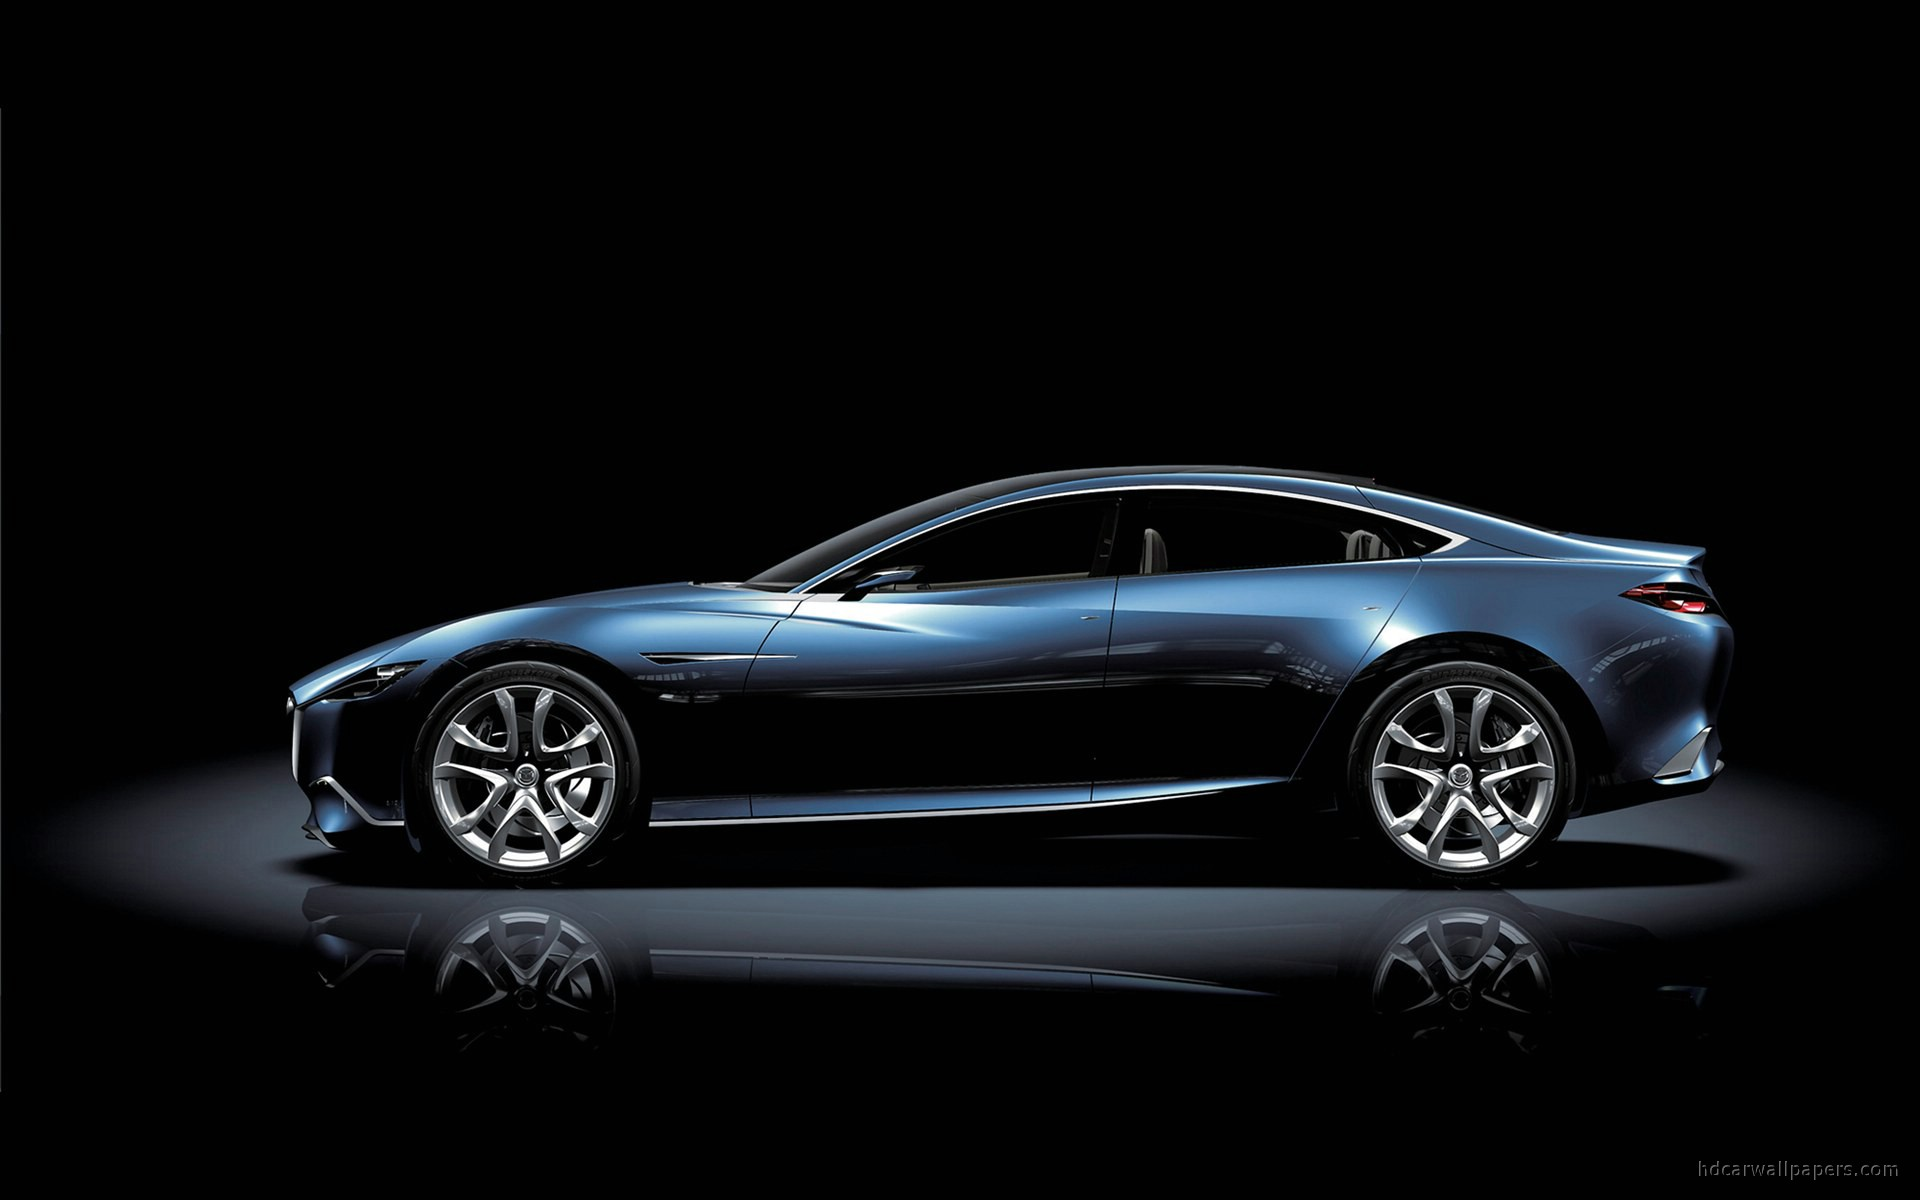 2011 Mazda Shinari Concept Wallpaper HD Car Wallpapers 1920x1200